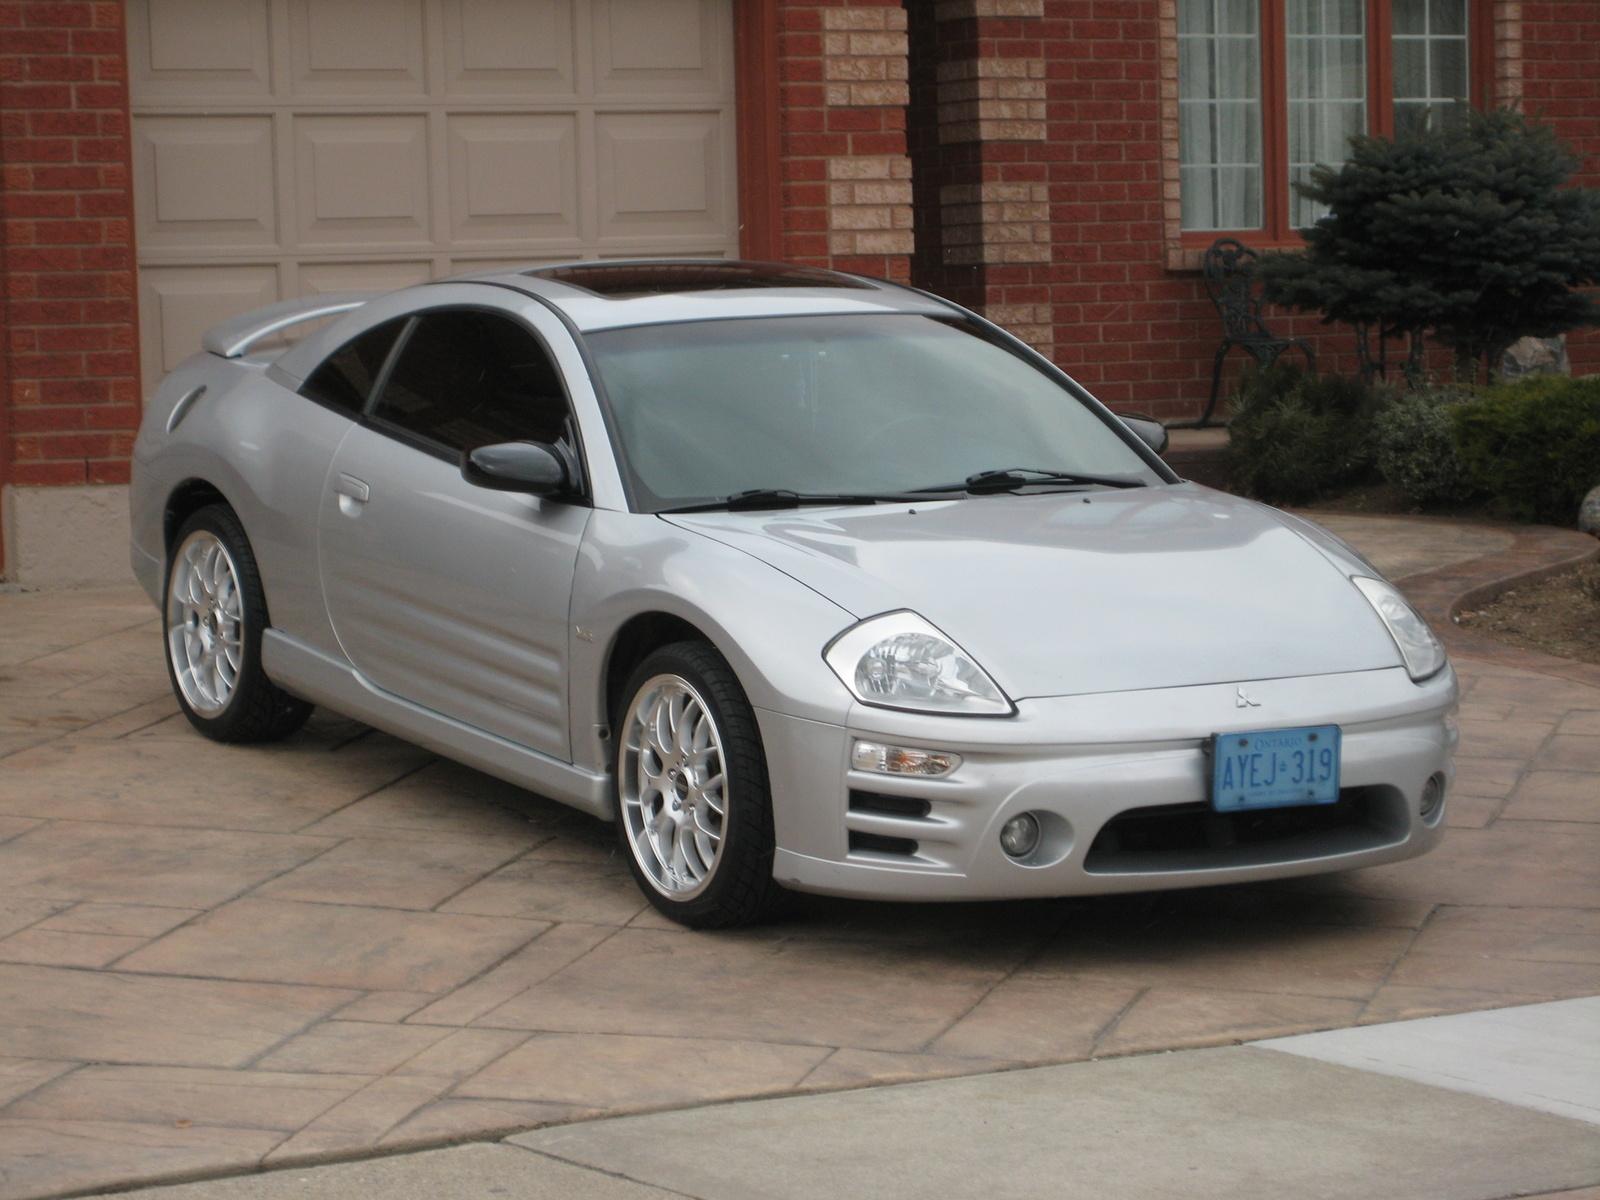 2003 Mitsubishi Eclipse Gts >> 2003 Mitsubishi Eclipse - Pictures - CarGurus